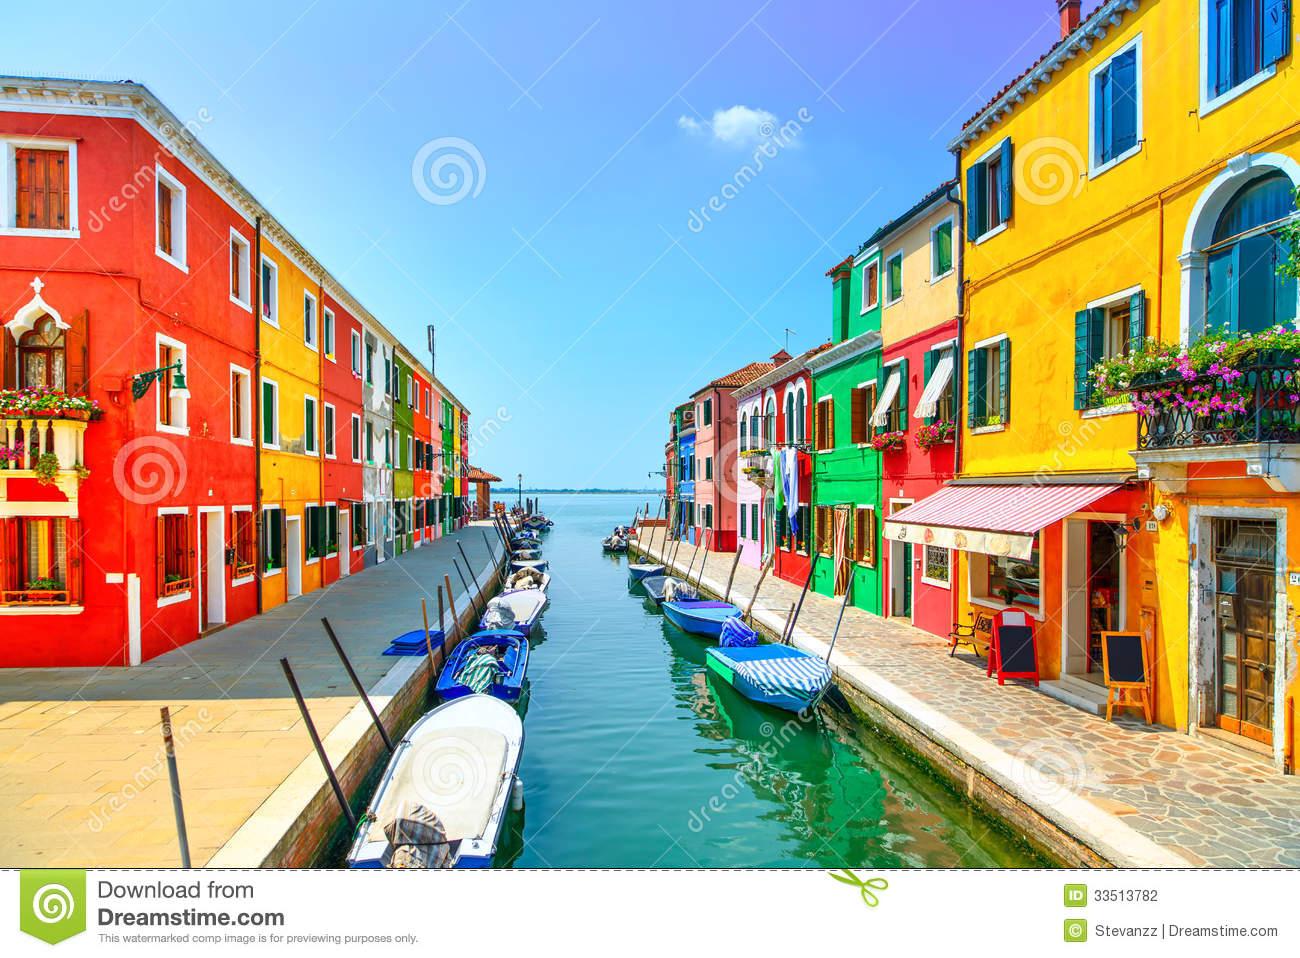 Venice Landmark, Burano Island Canal, Colorful Houses, Church And.